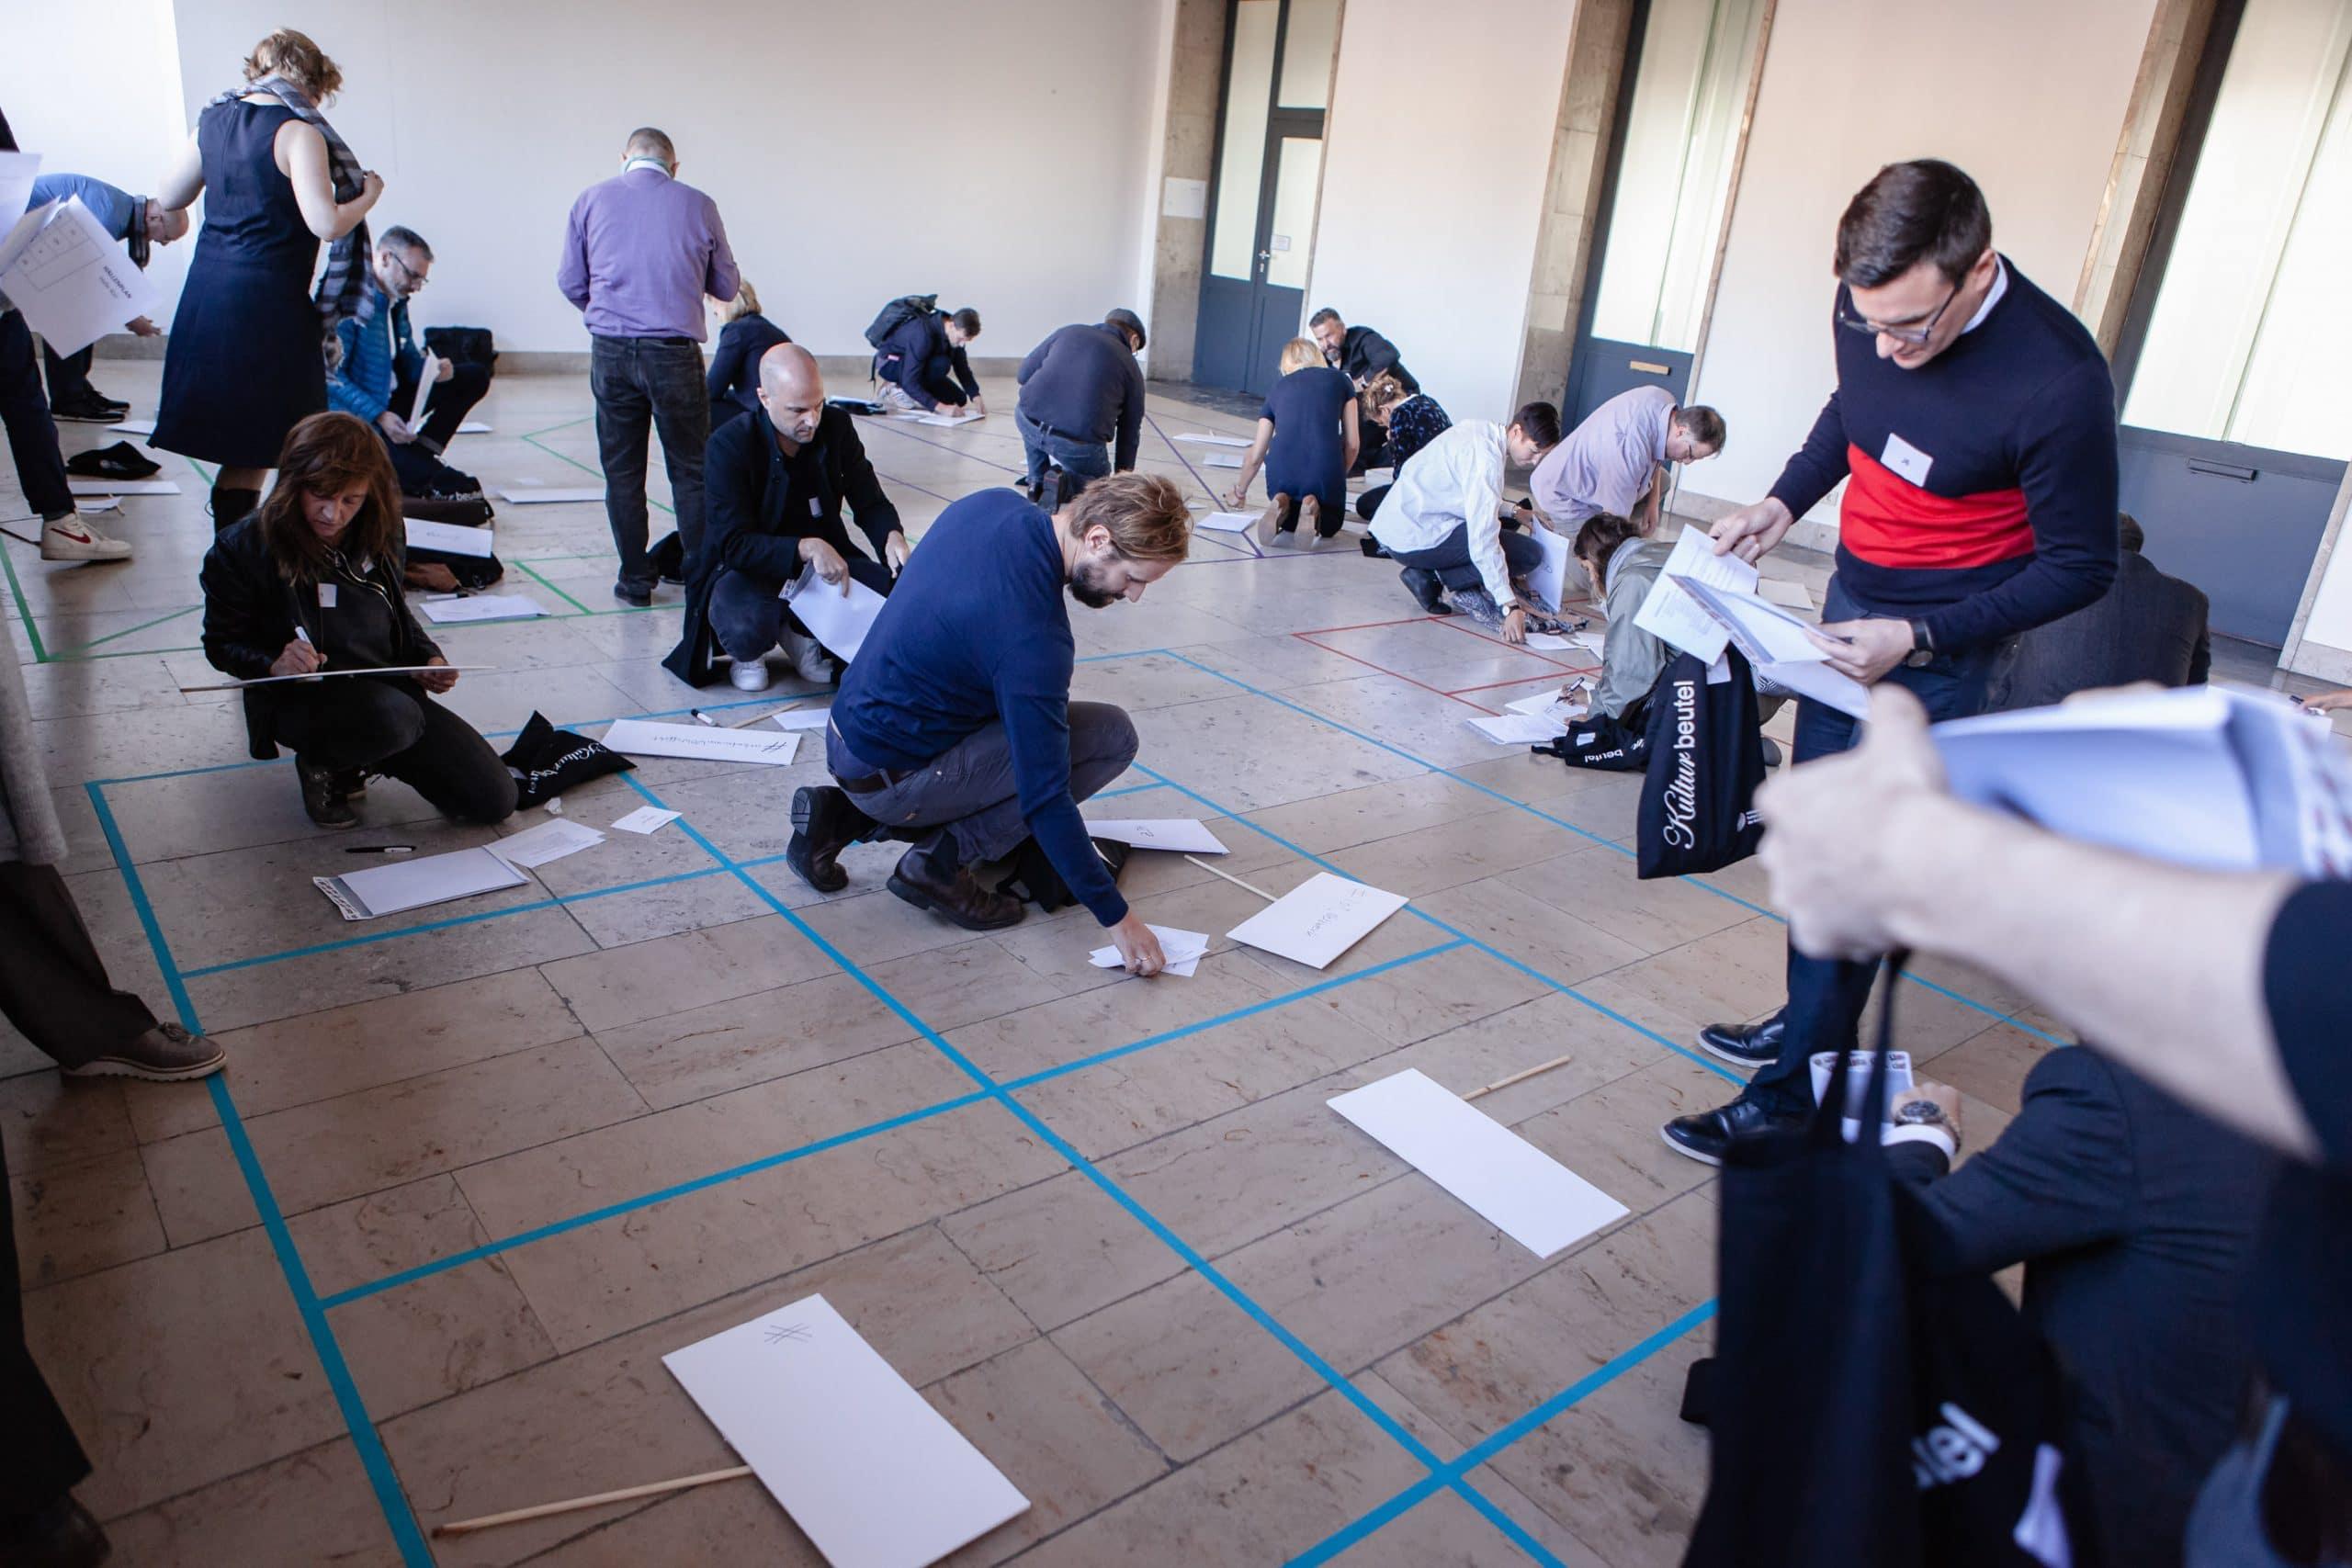 Messe-Workshop | GAT, Flughafen Tempelhof, Berlin – 25.09.2018